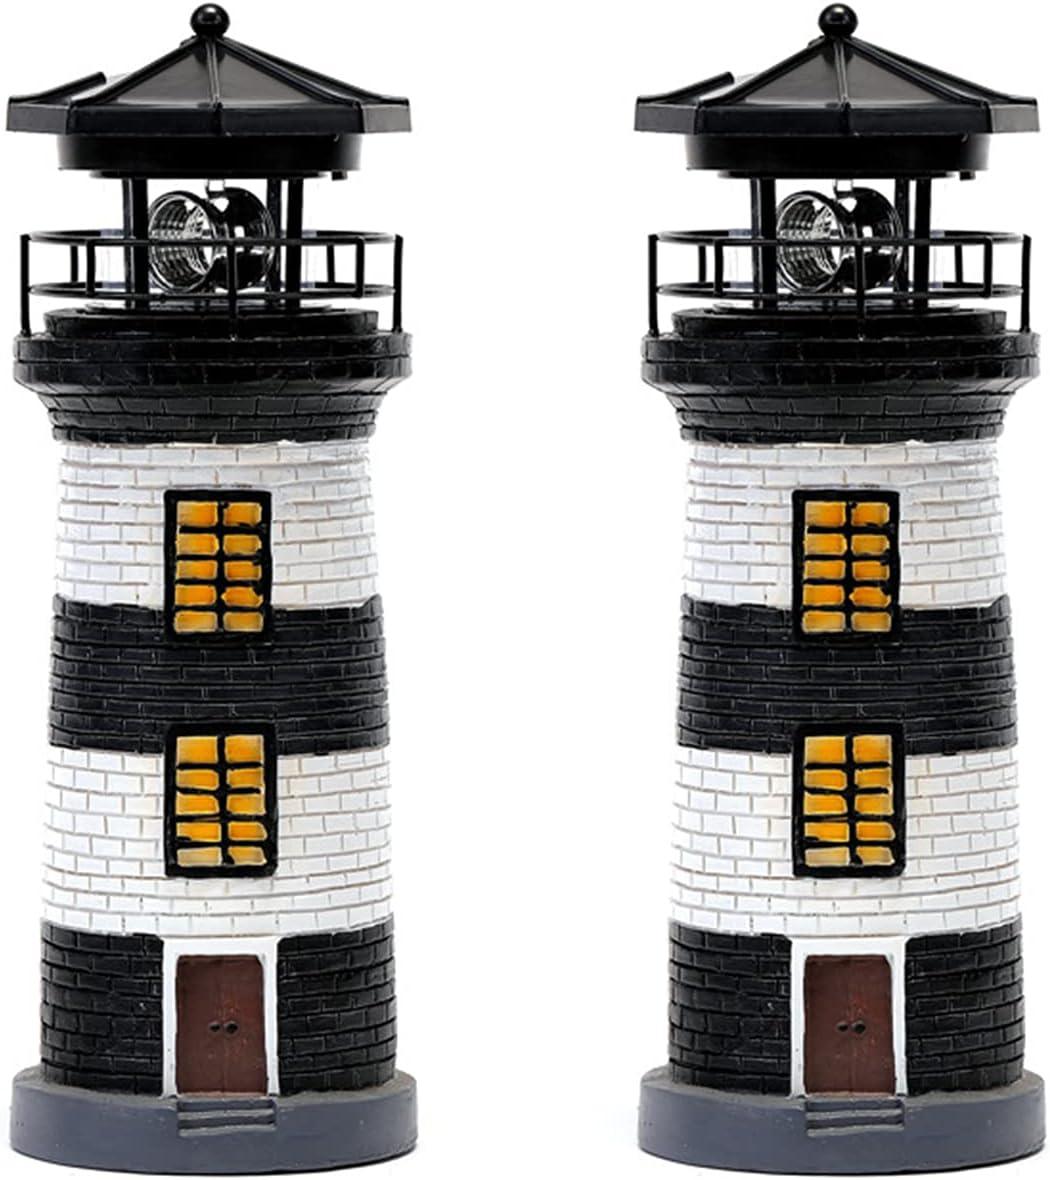 ZLFS 2 Pcs LED Las Vegas Mall Solar Lighthouse Resin Statue Crafts OFFer